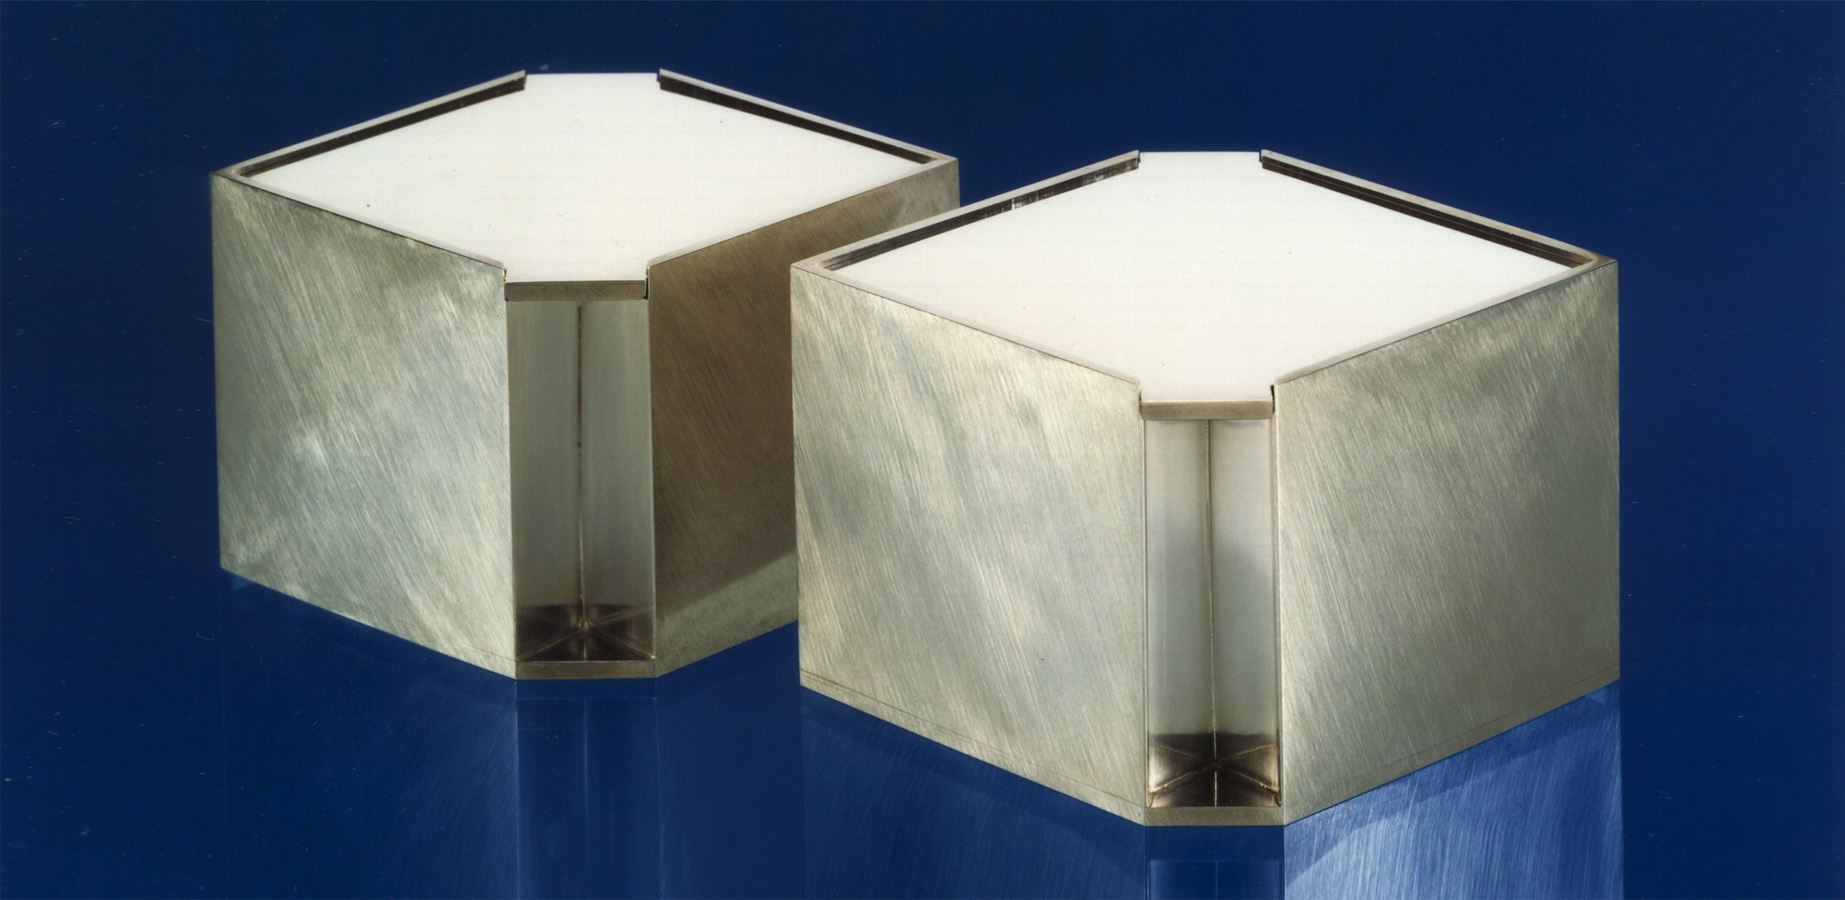 2  Dosen  1987  Silber 925  91x68x68  mm